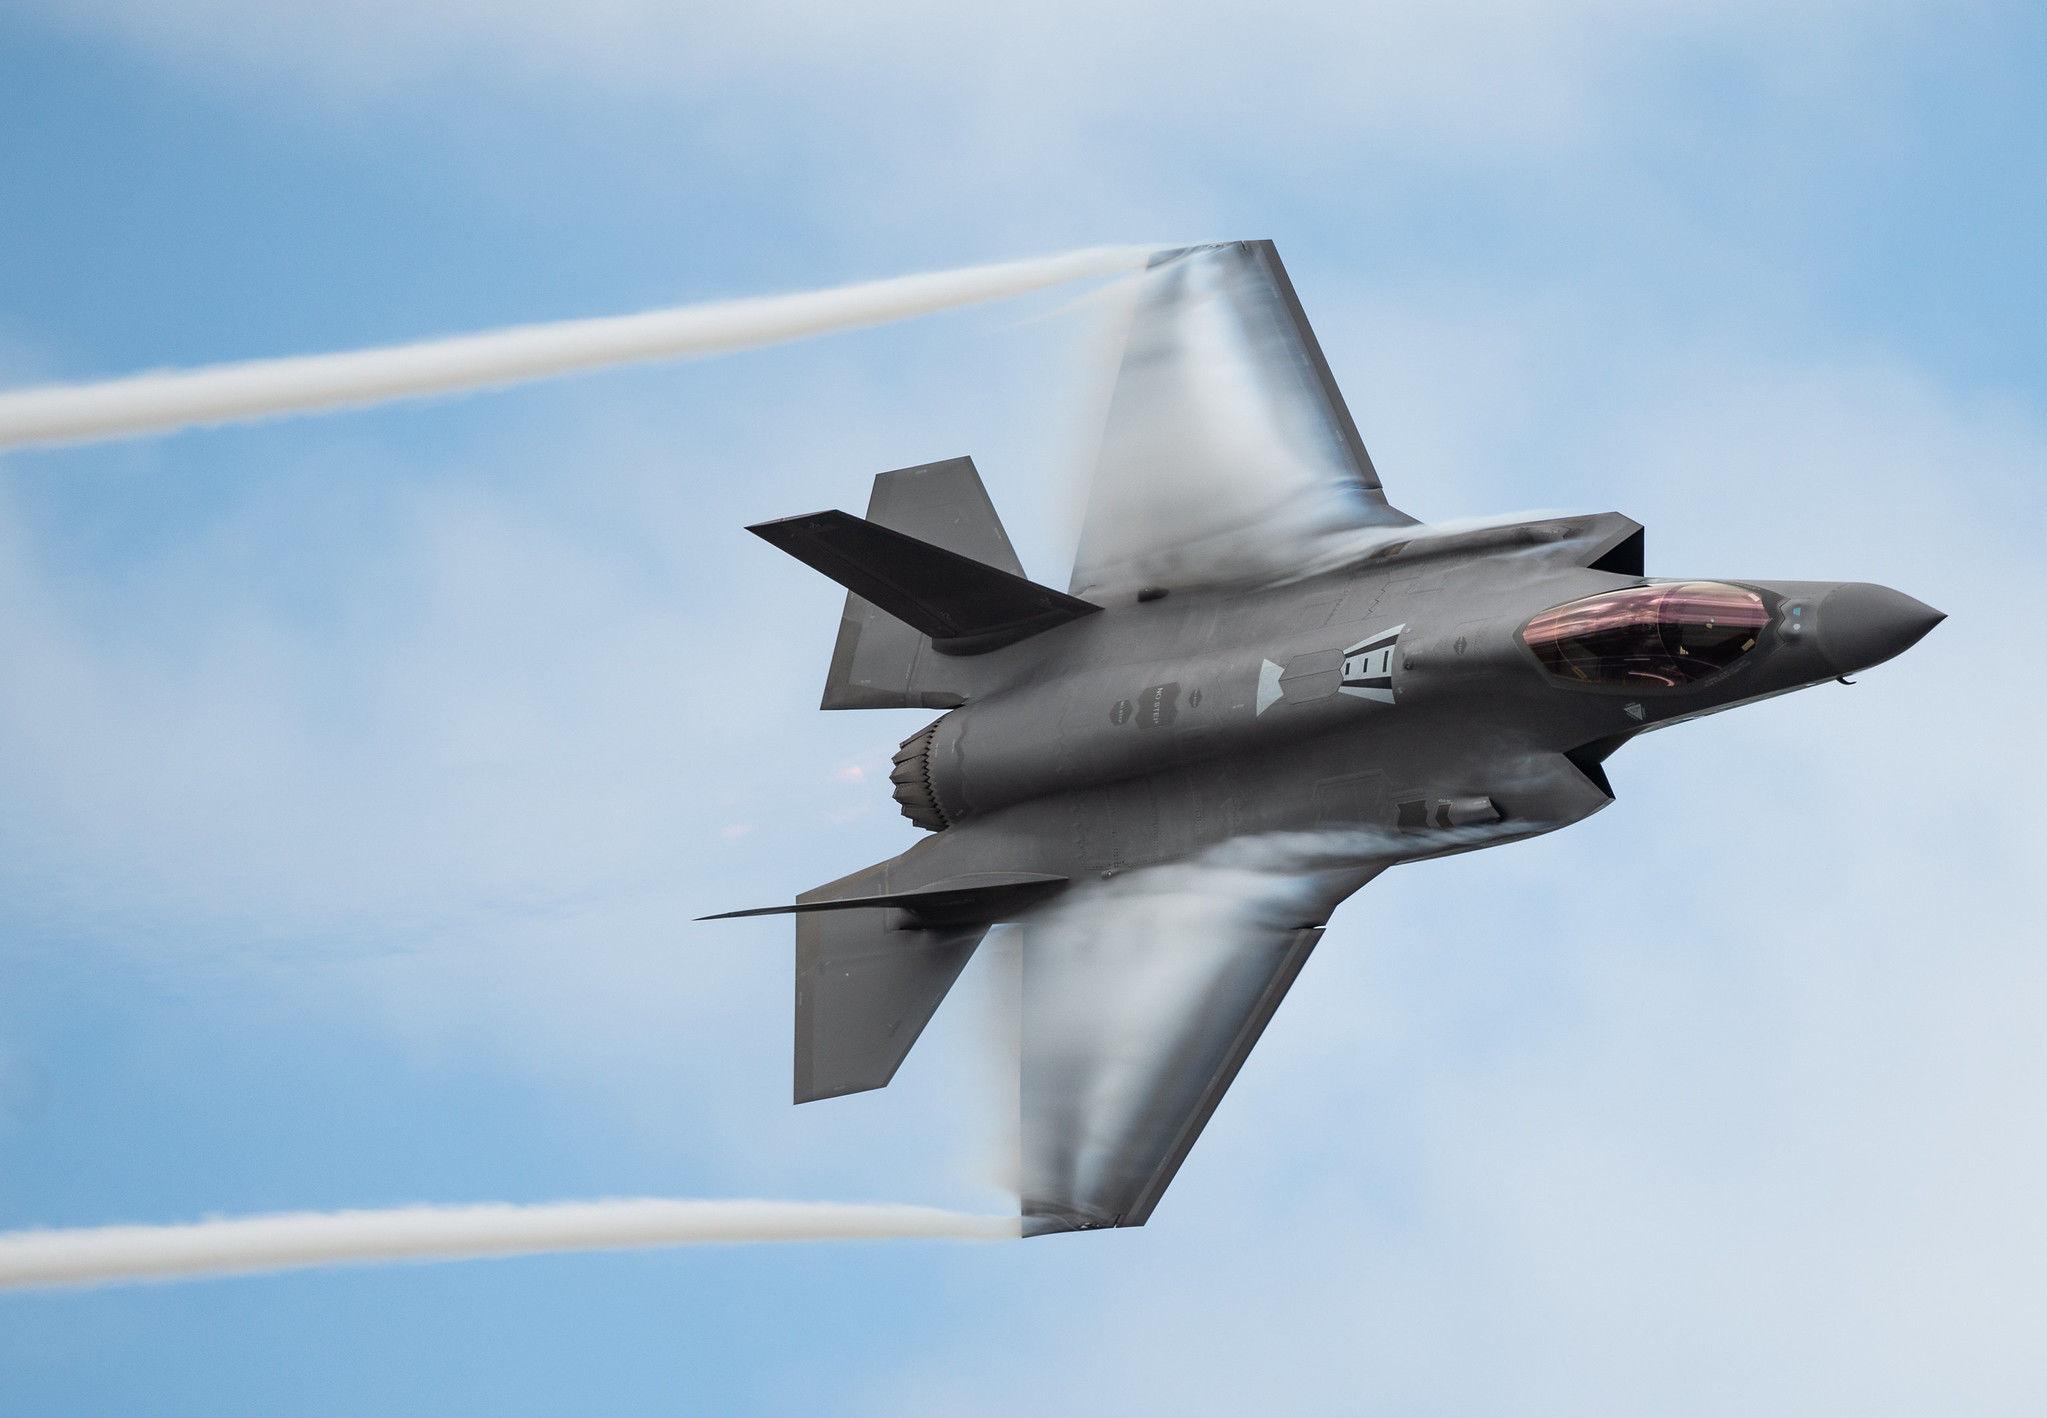 Stíhačka páté generace F-35